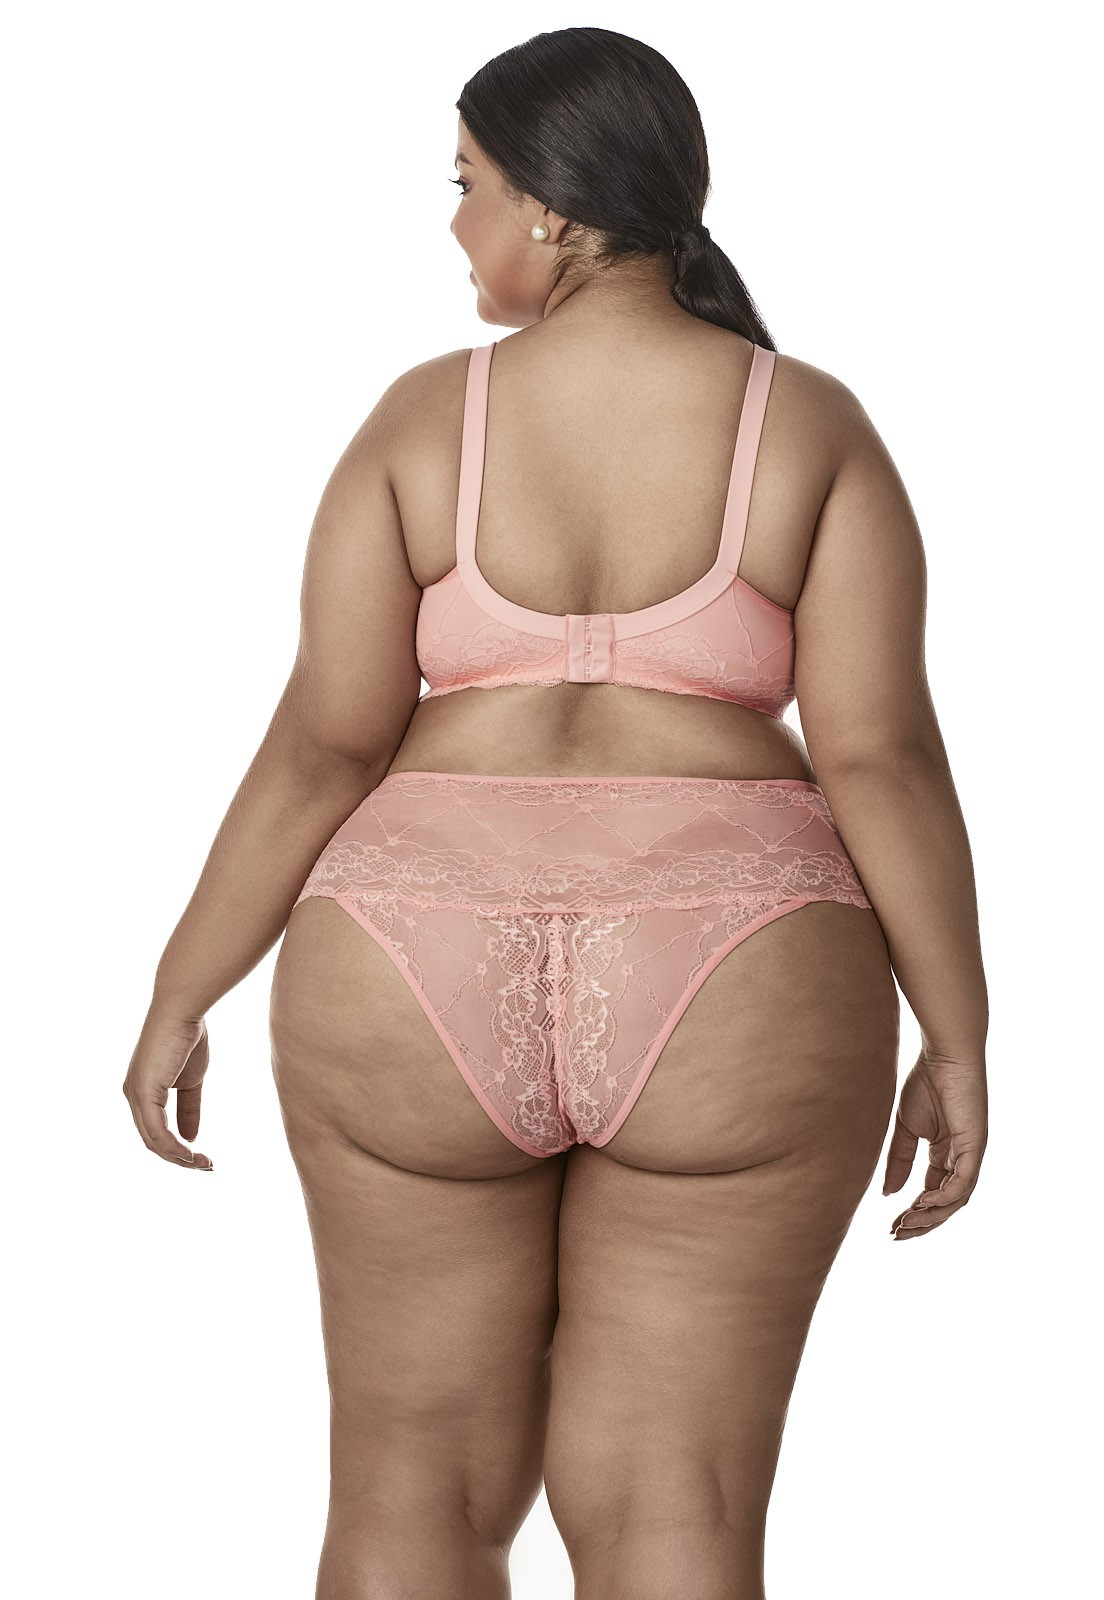 Sutiã de renda drapeado Dukley Lingerie Plus Size - Sempre Rosa - 144